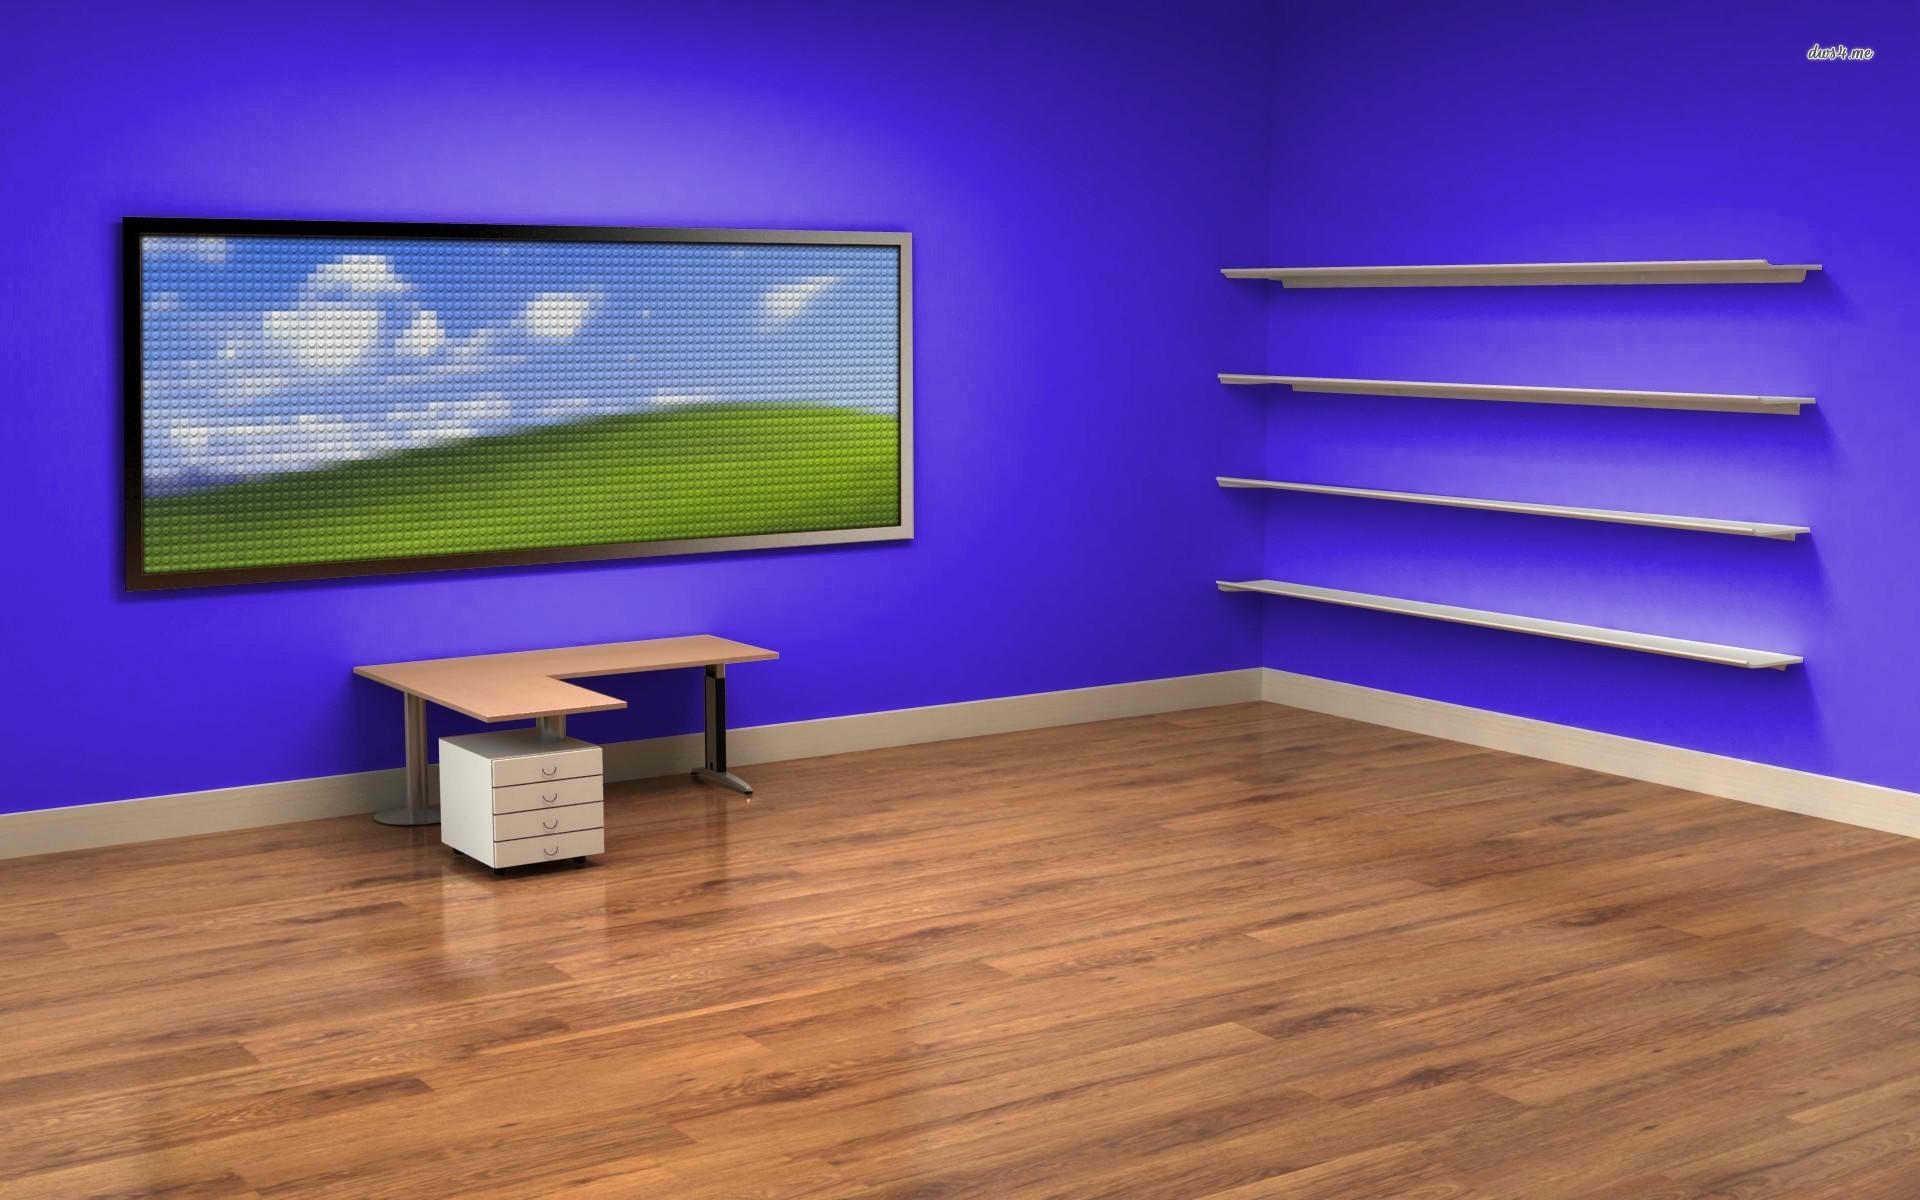 Empty office wallpaper – Digital Art wallpapers – #20826